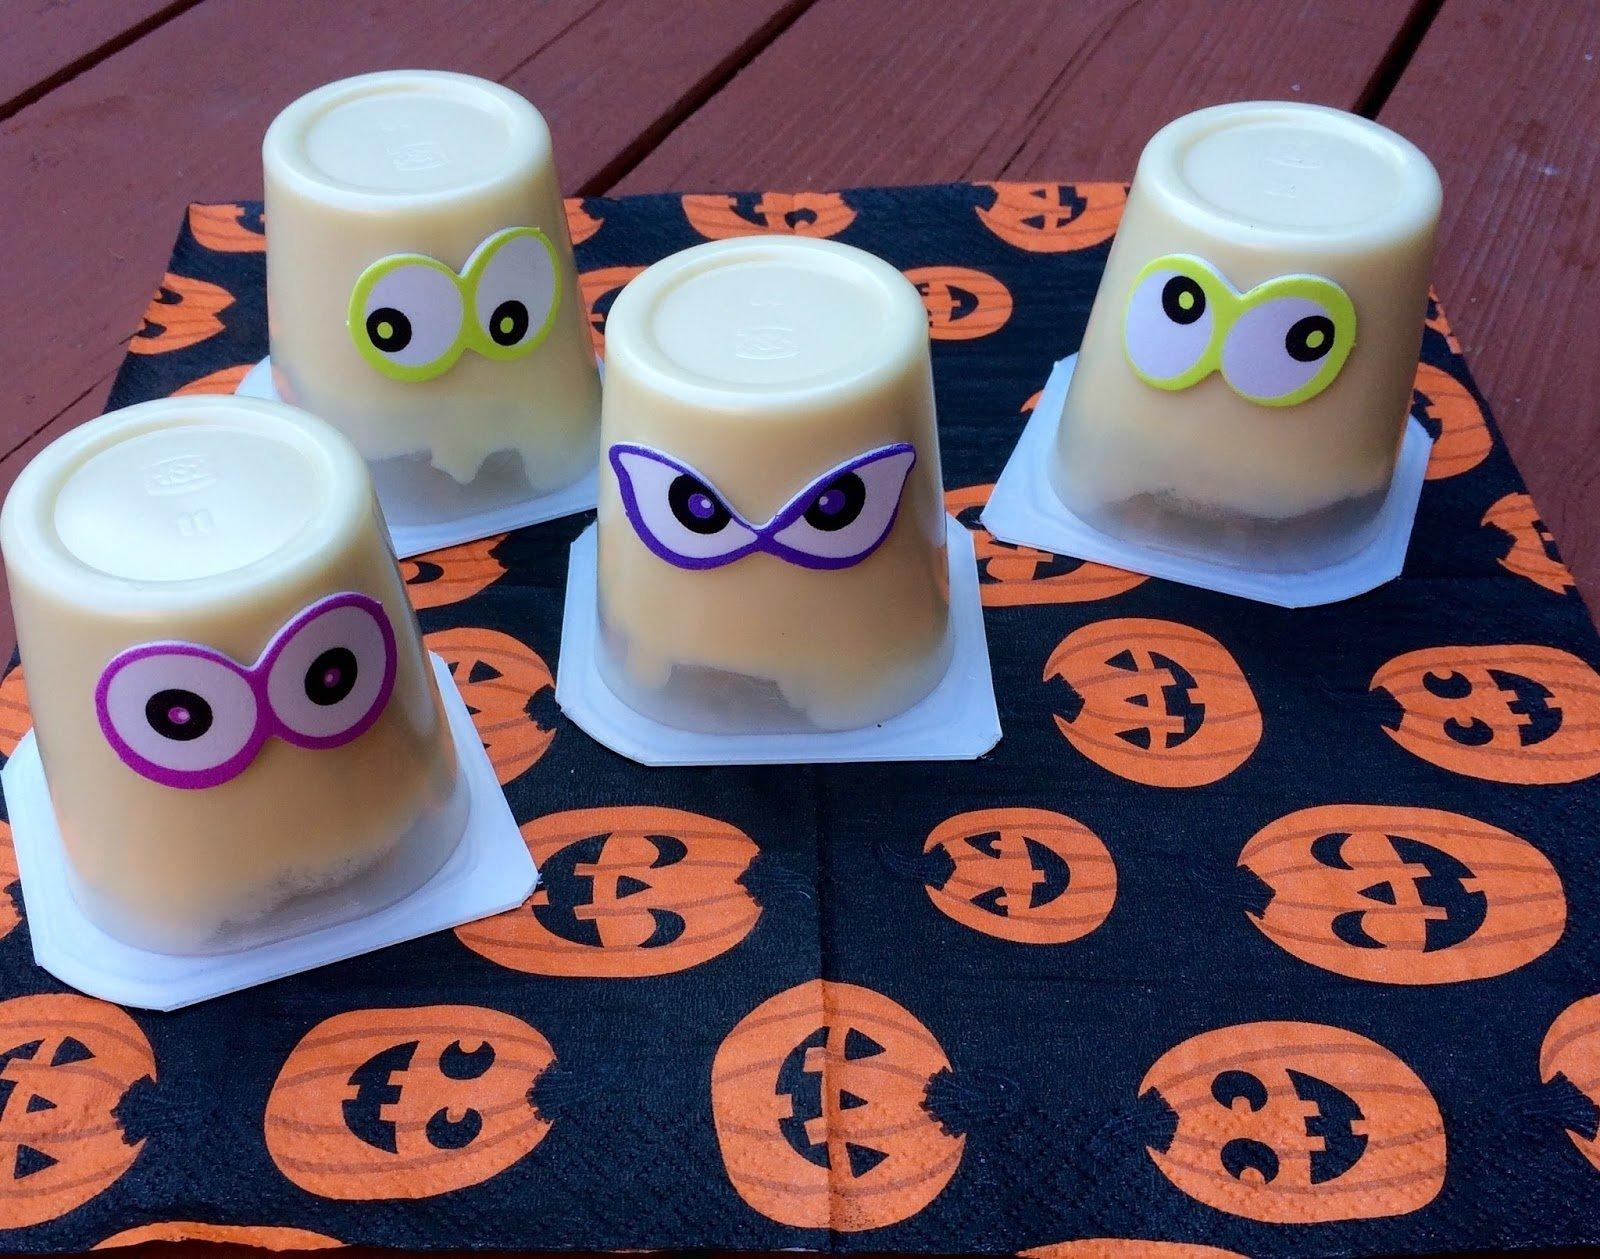 10 Cute Halloween Treat Ideas For Kids last minute easy halloween treats the chirping moms 2020